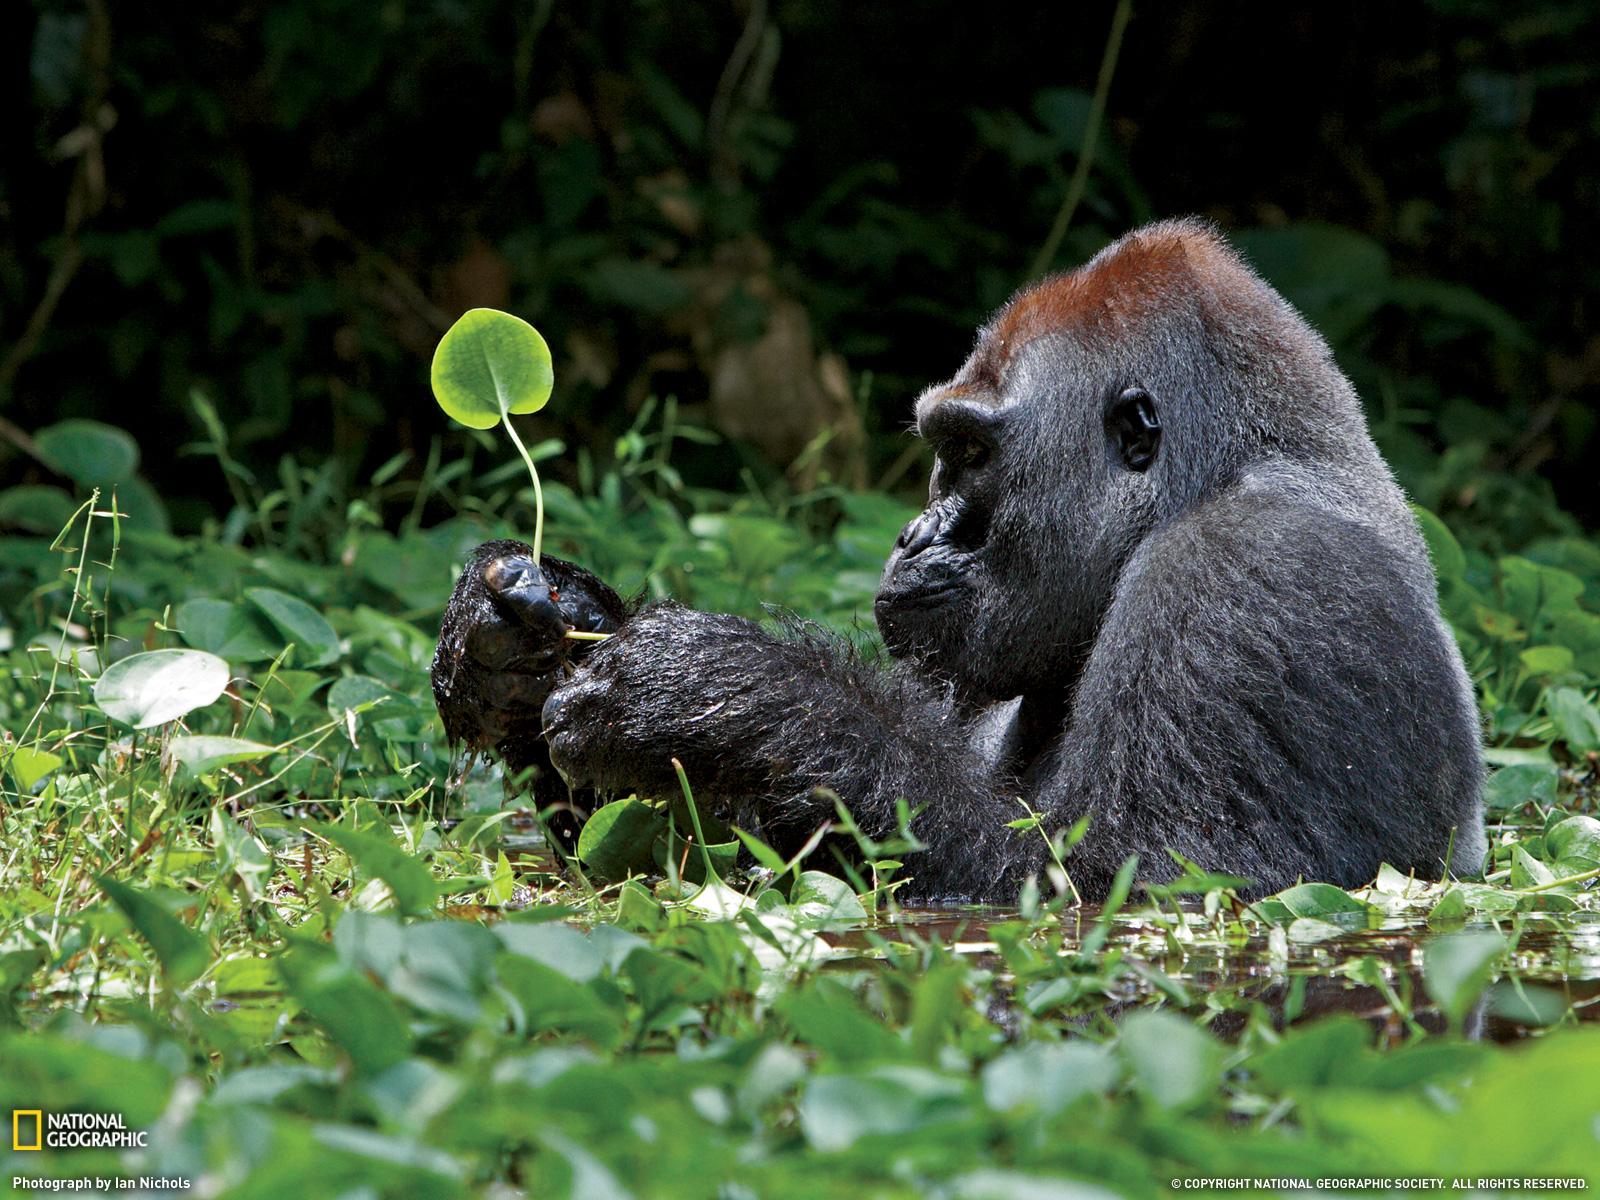 Silverback Gorilla Photo Nature Wallpaper National Geographic 1600x1200